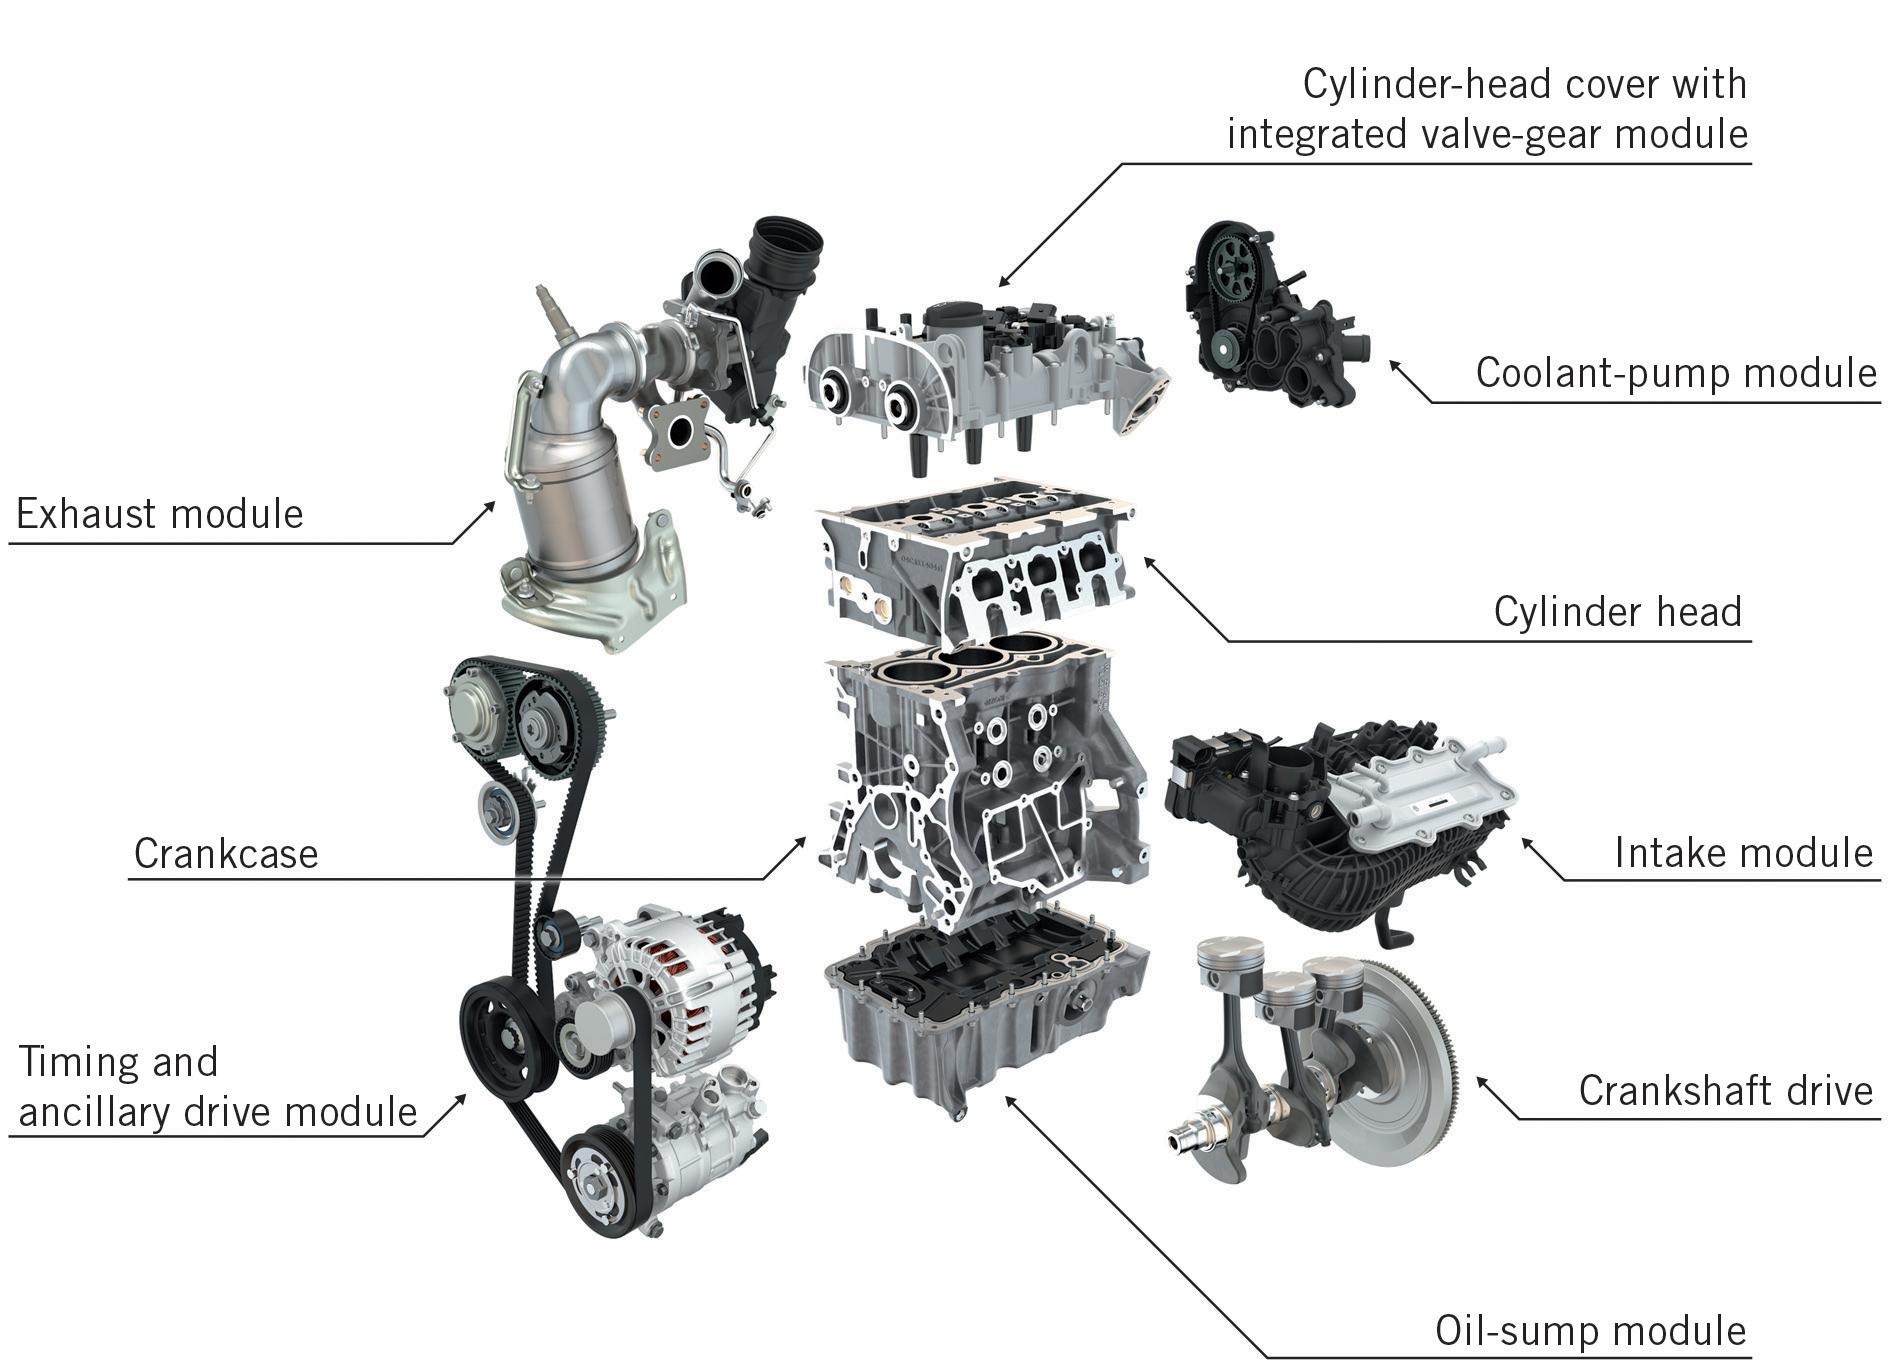 Vw 1 0 Tsi Engine Diagram - All Wiring Diagram